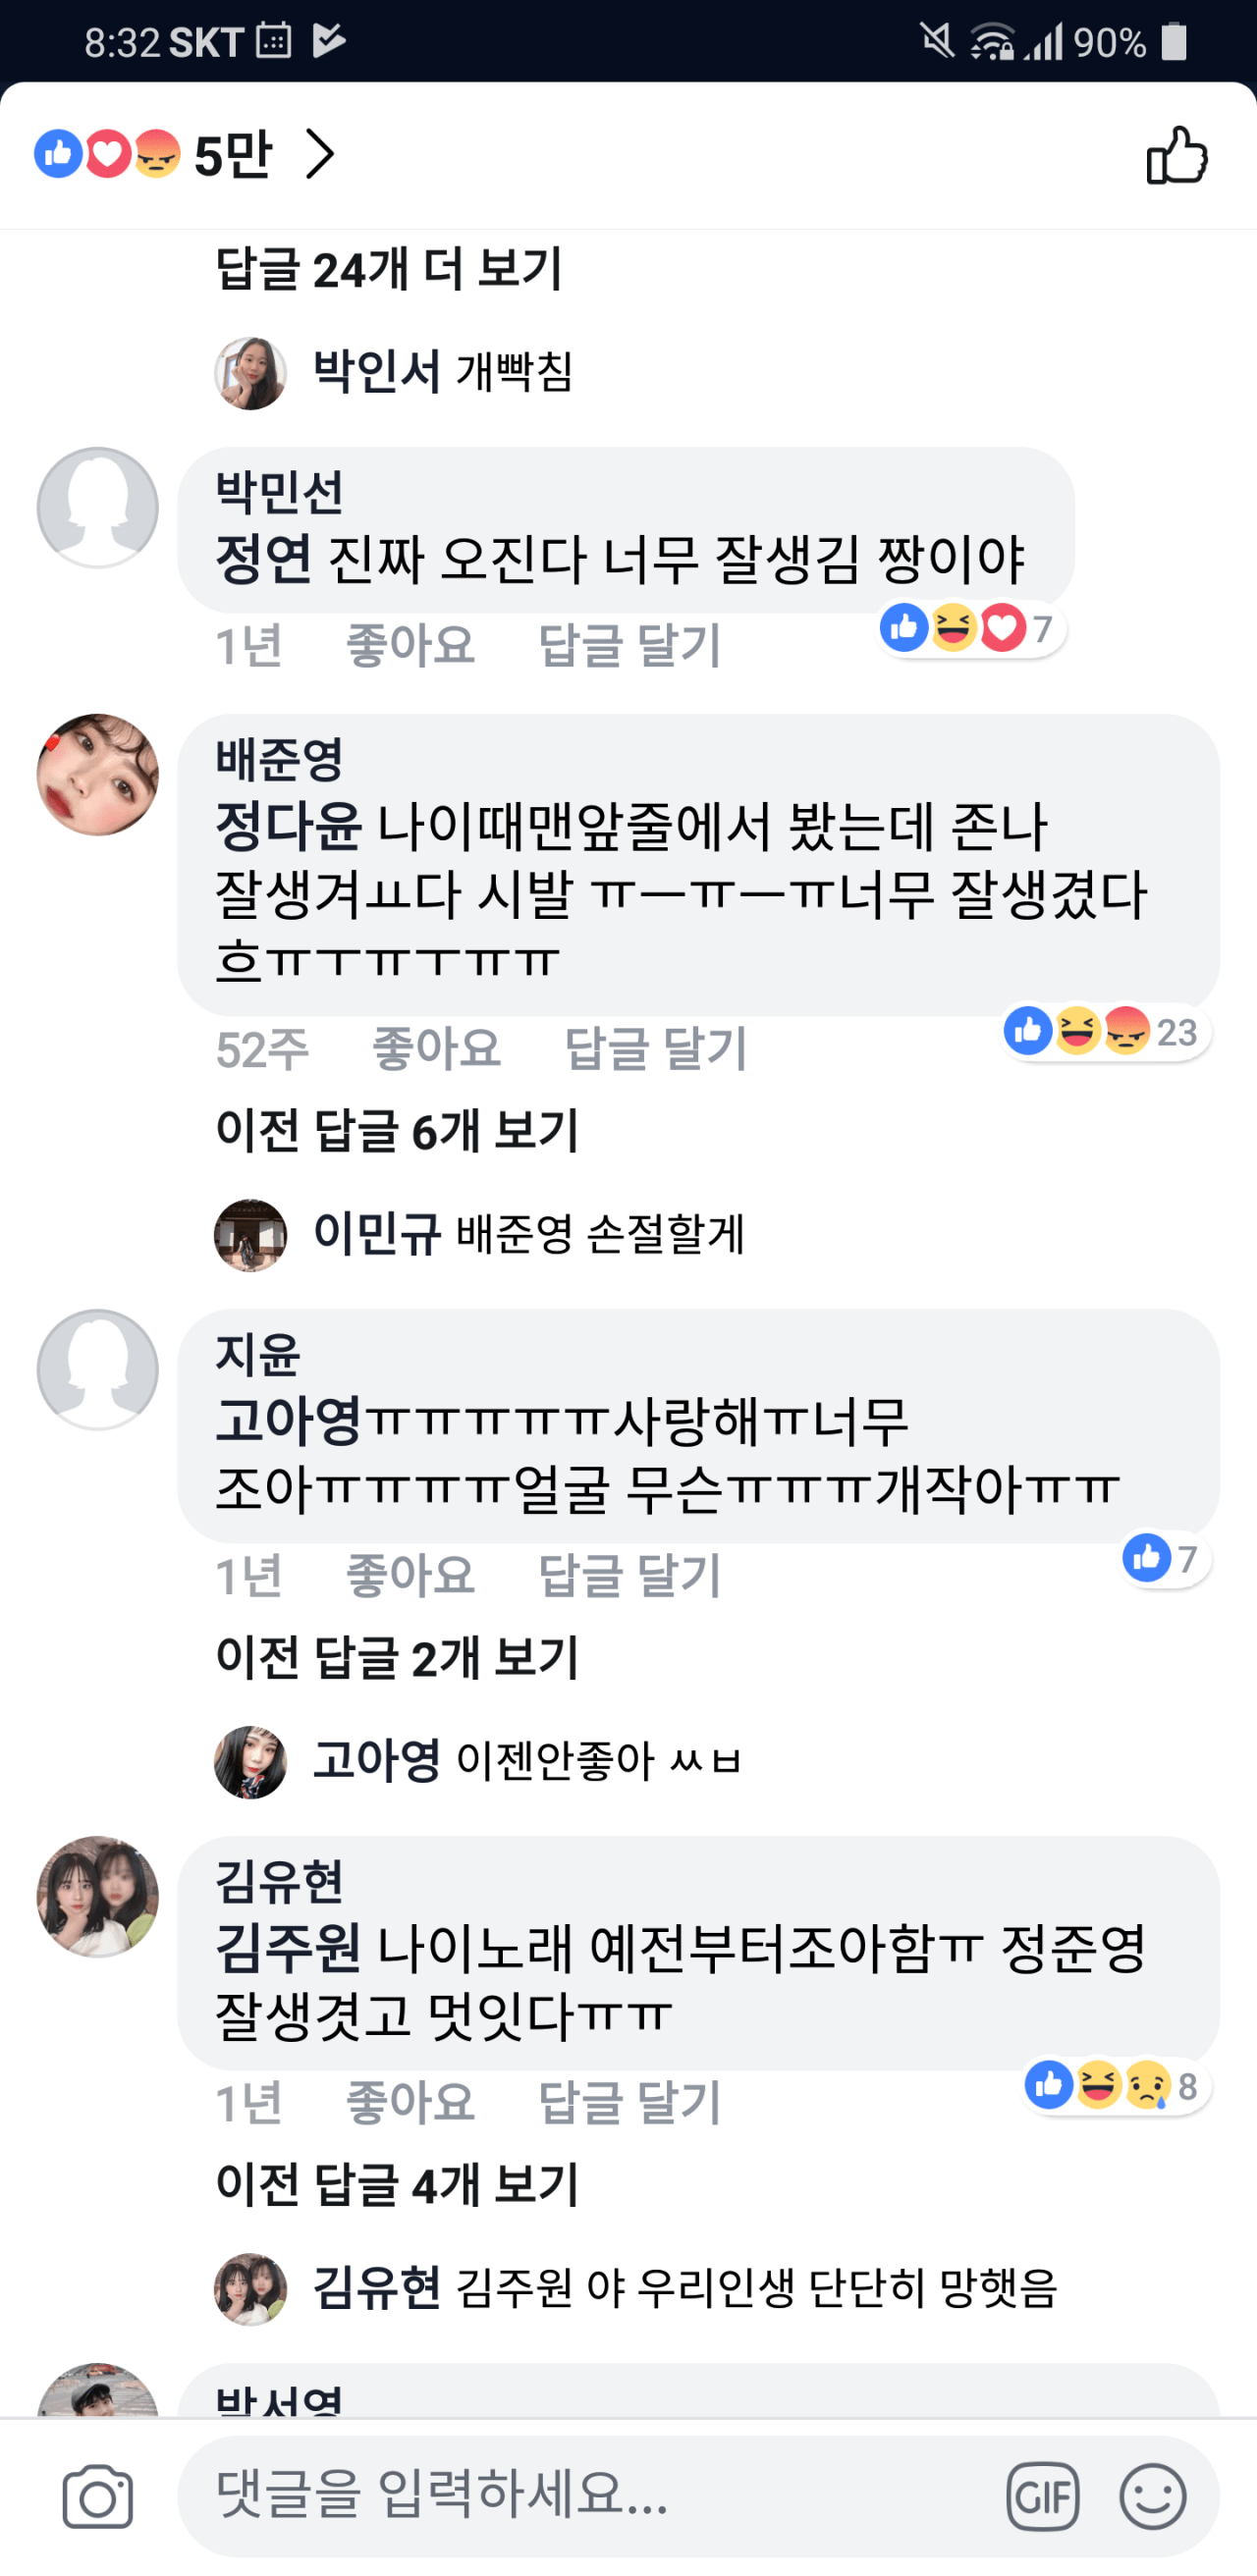 Capture+_2019-03-16-08-32-51.png 정준영 팬들 근황